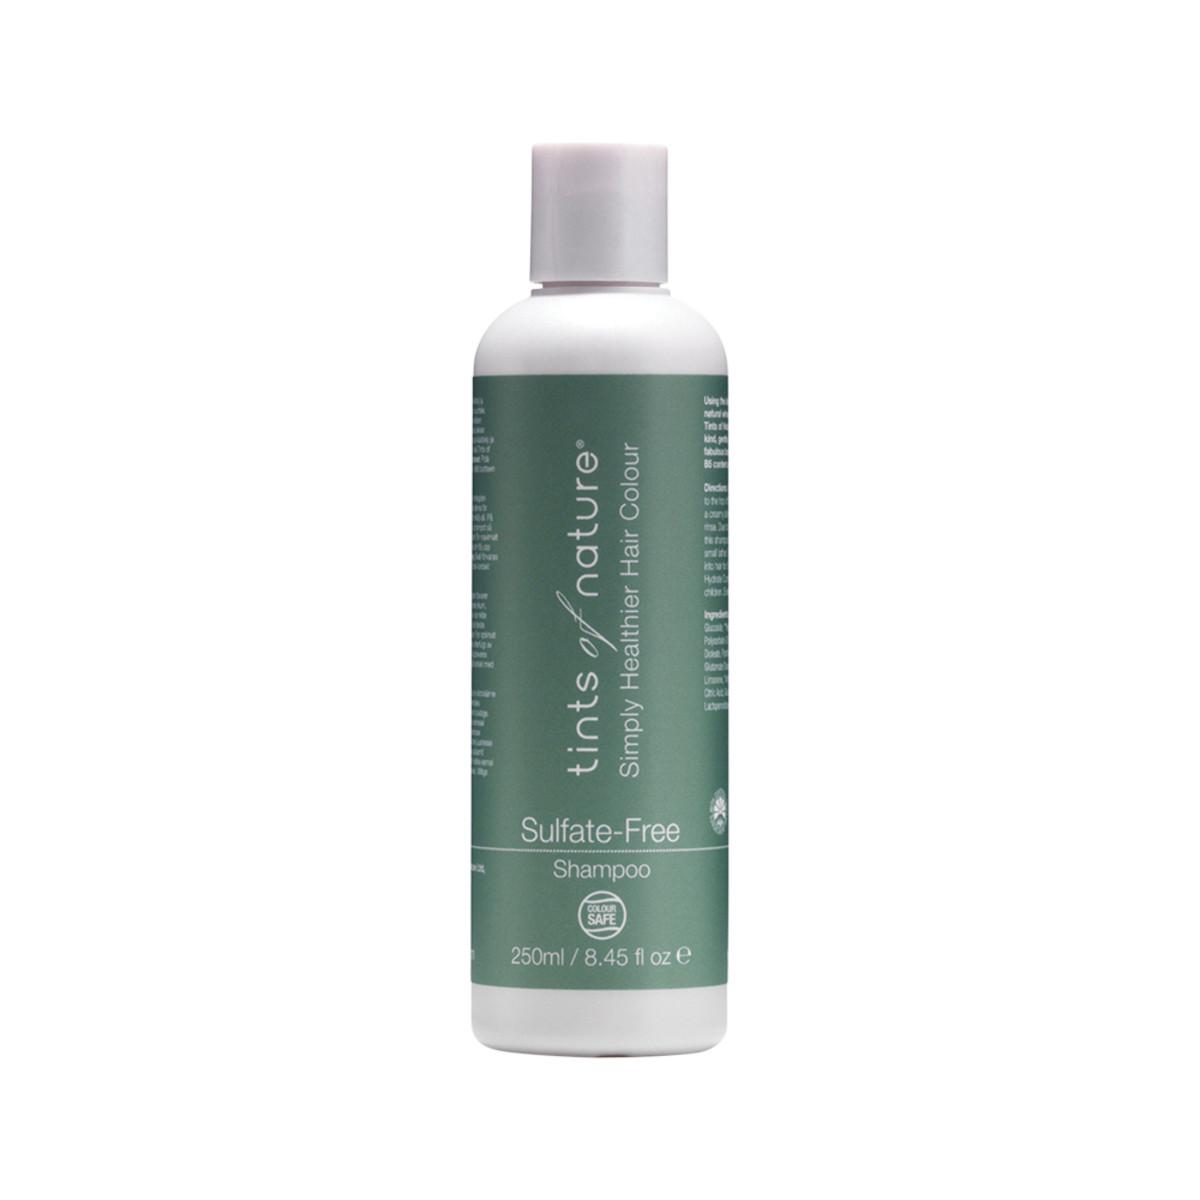 TINTS OF NATURE Shampoo Sulfate Free 250ml